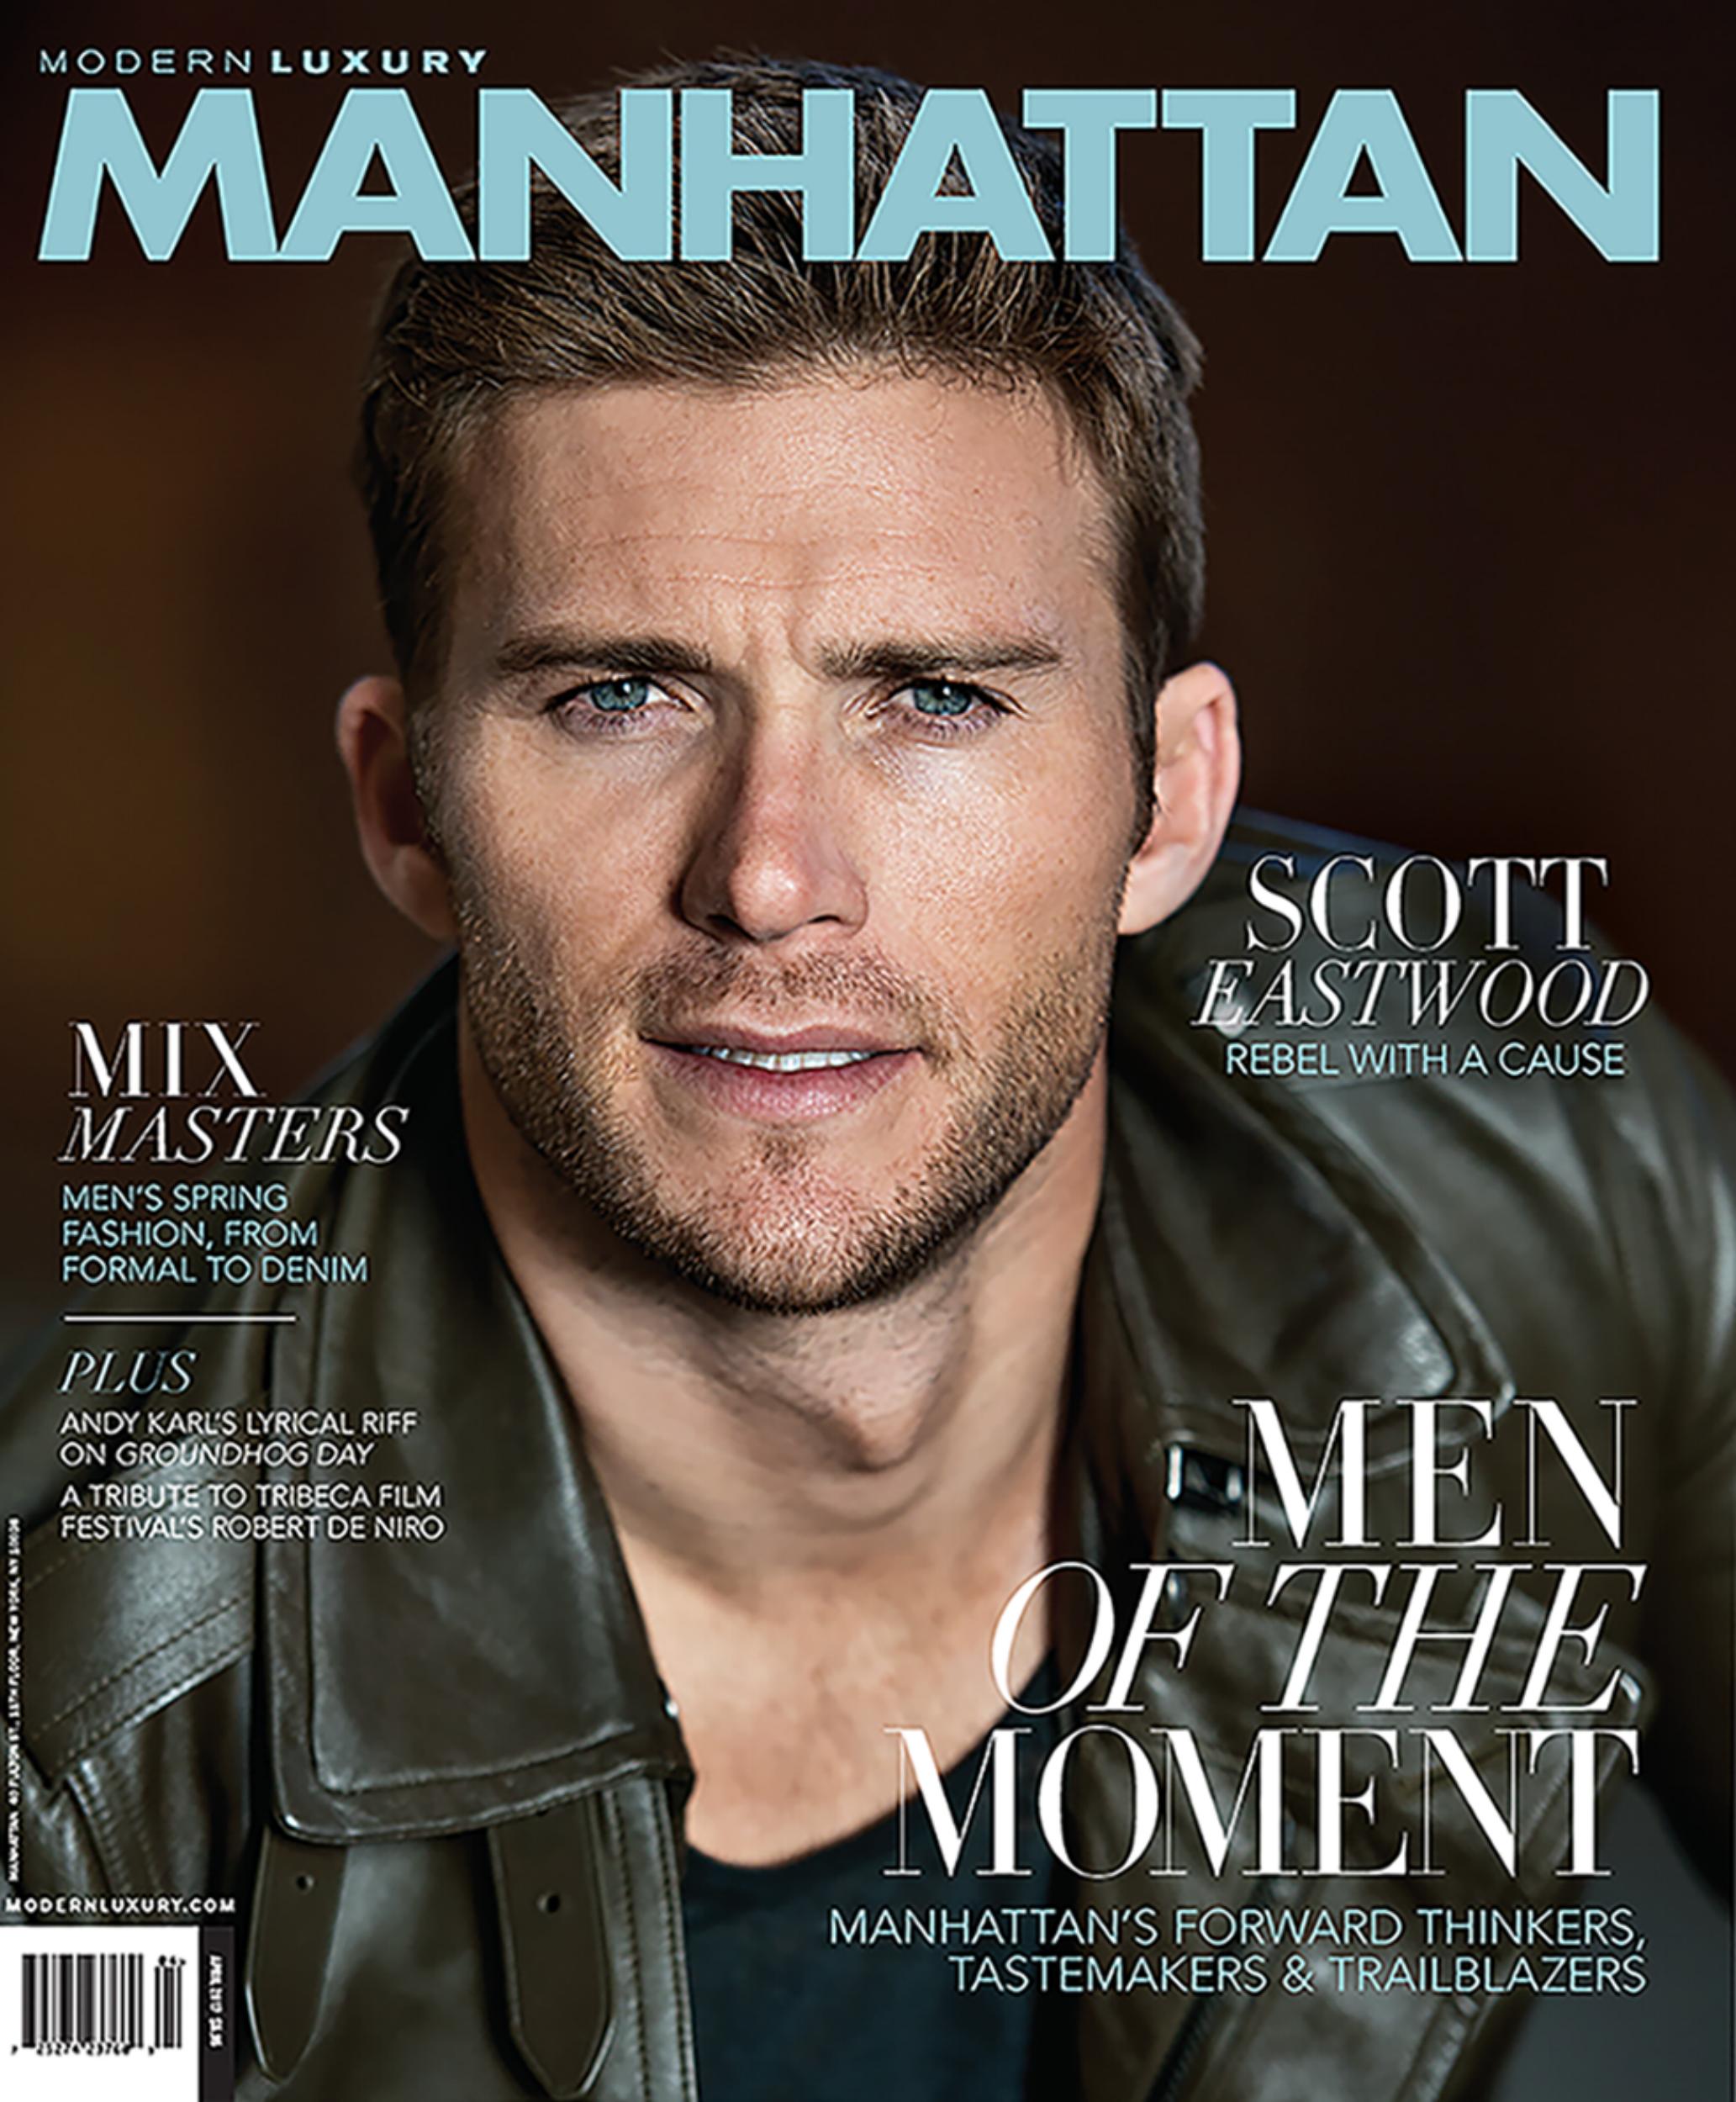 BB_Manhattan Magazine_April 2017_Page_1.png